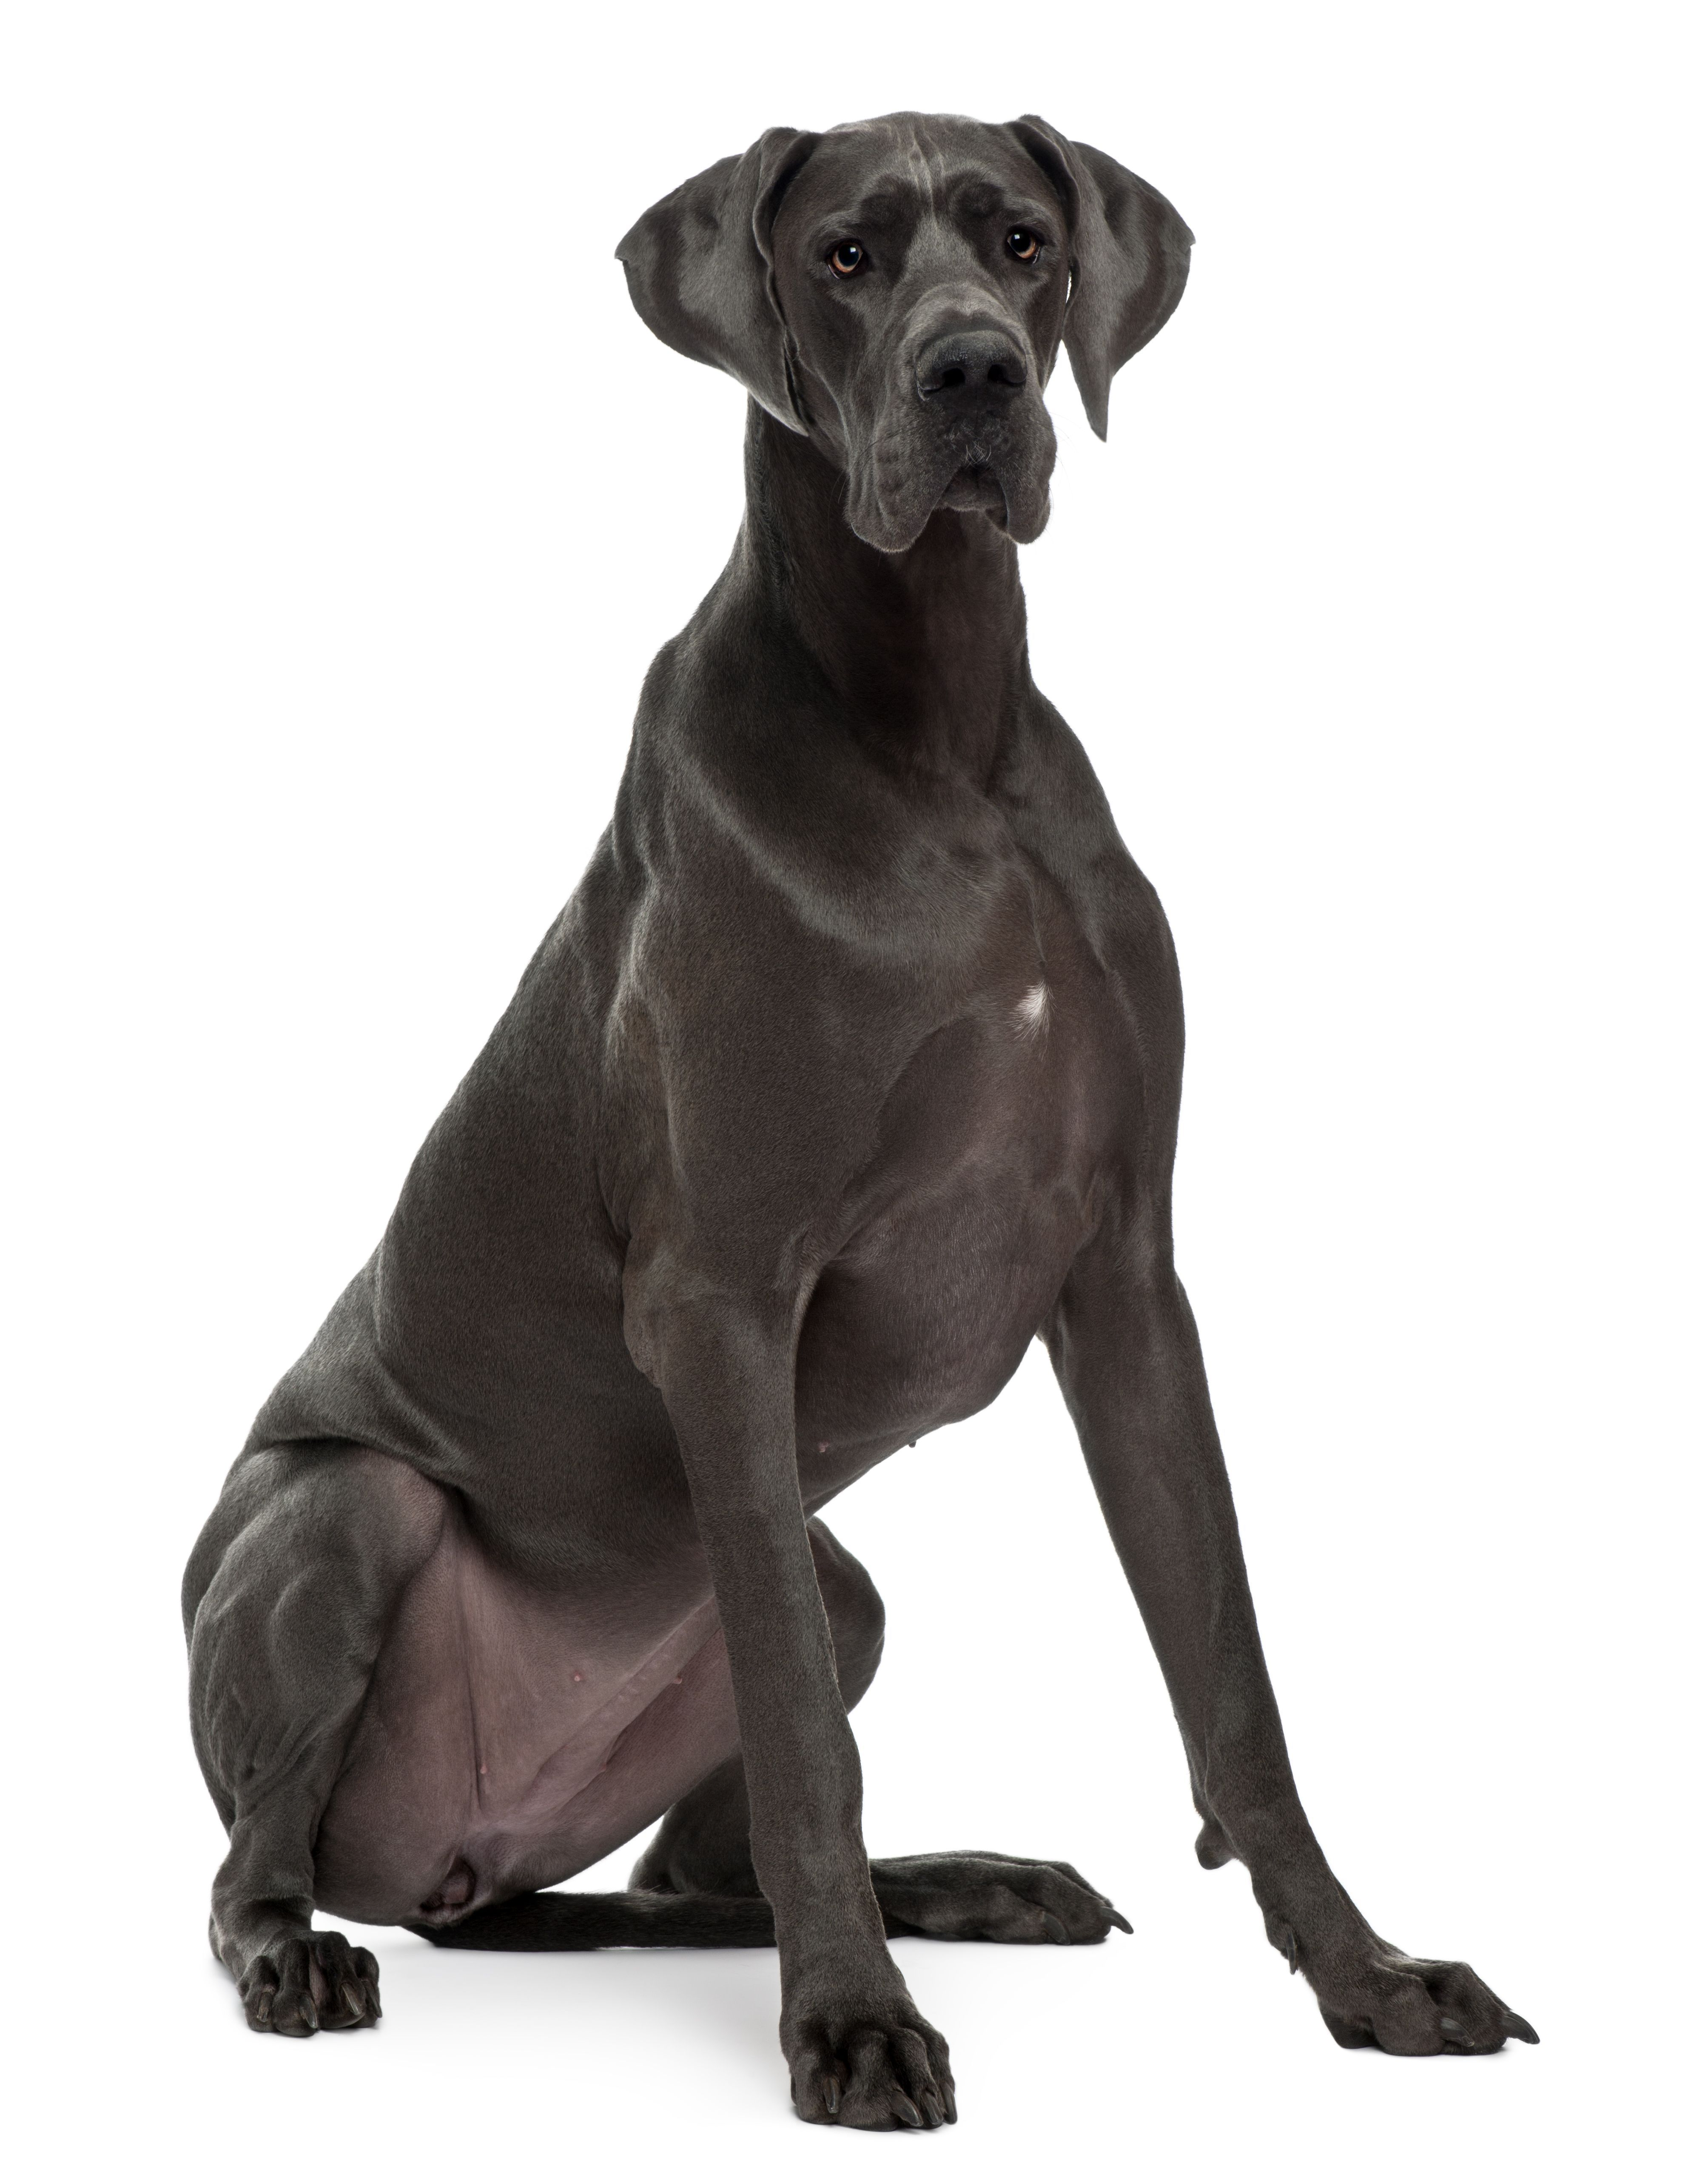 Dominick Gabone Dane Dog Dog Mafia Inc Take A Look At The Mafia